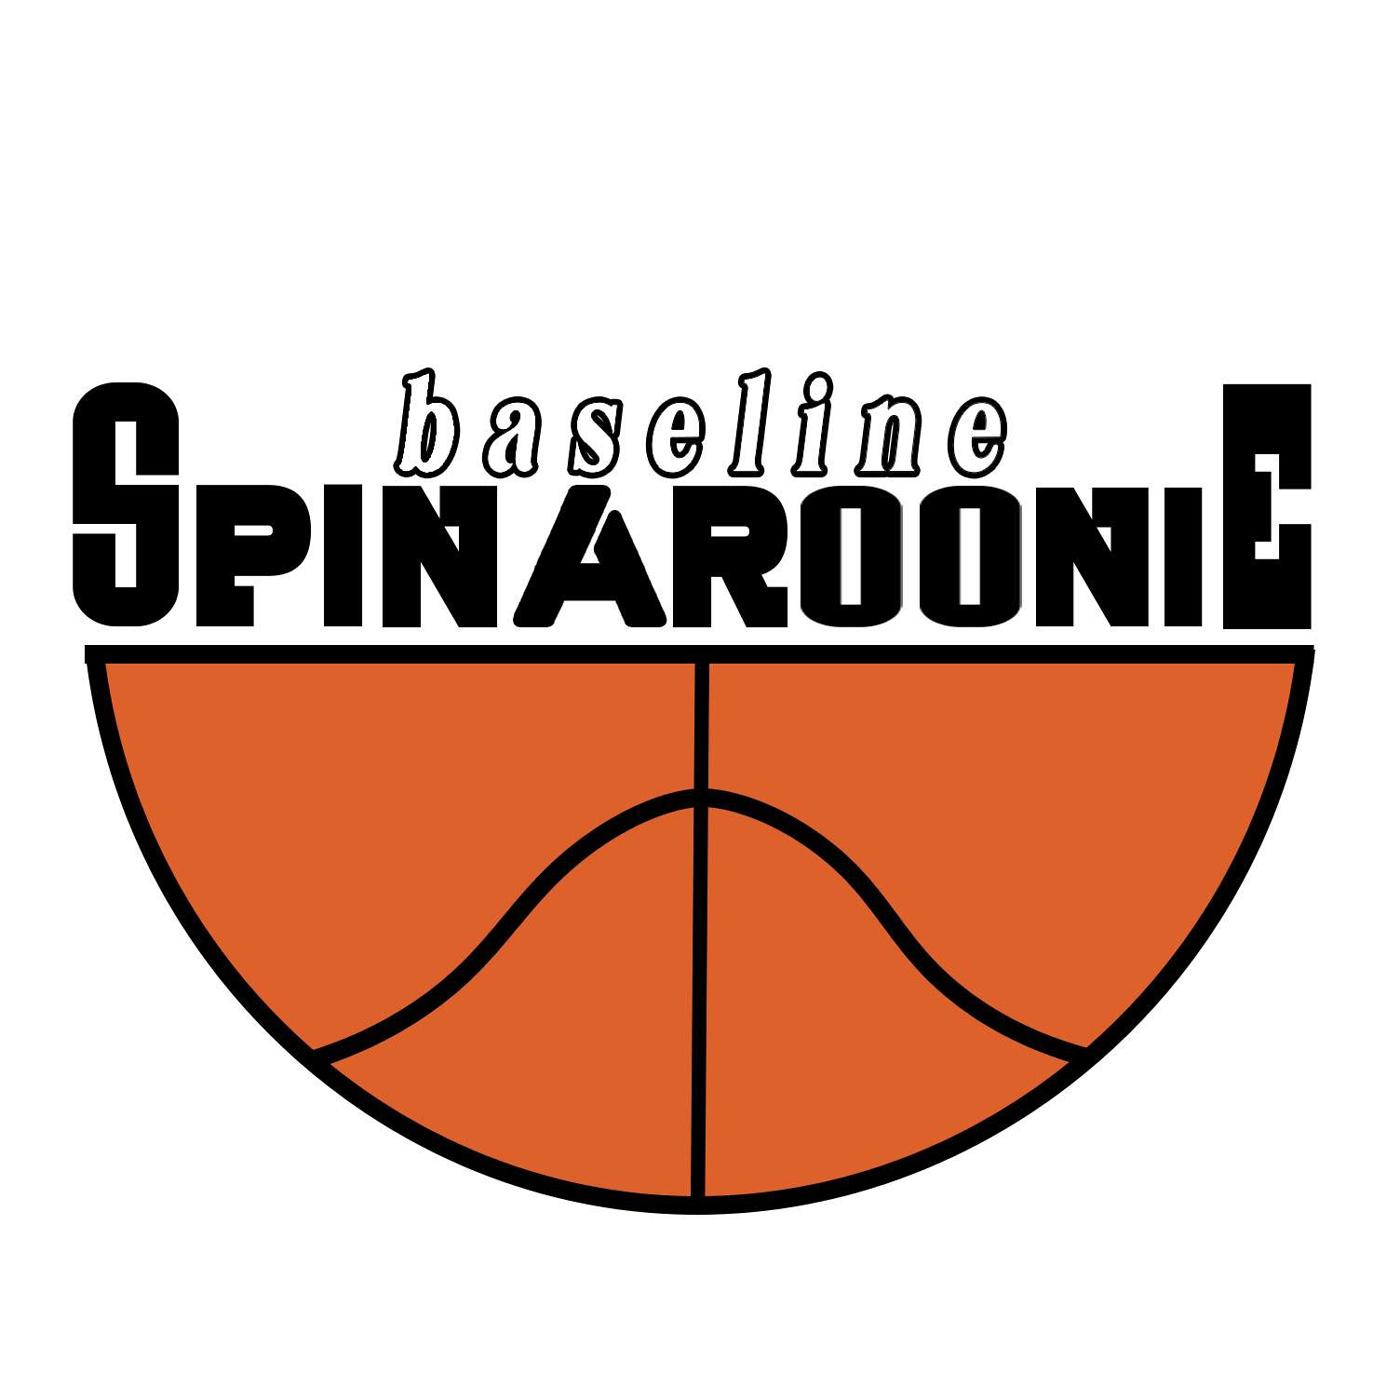 The Baseline Spinaroonie